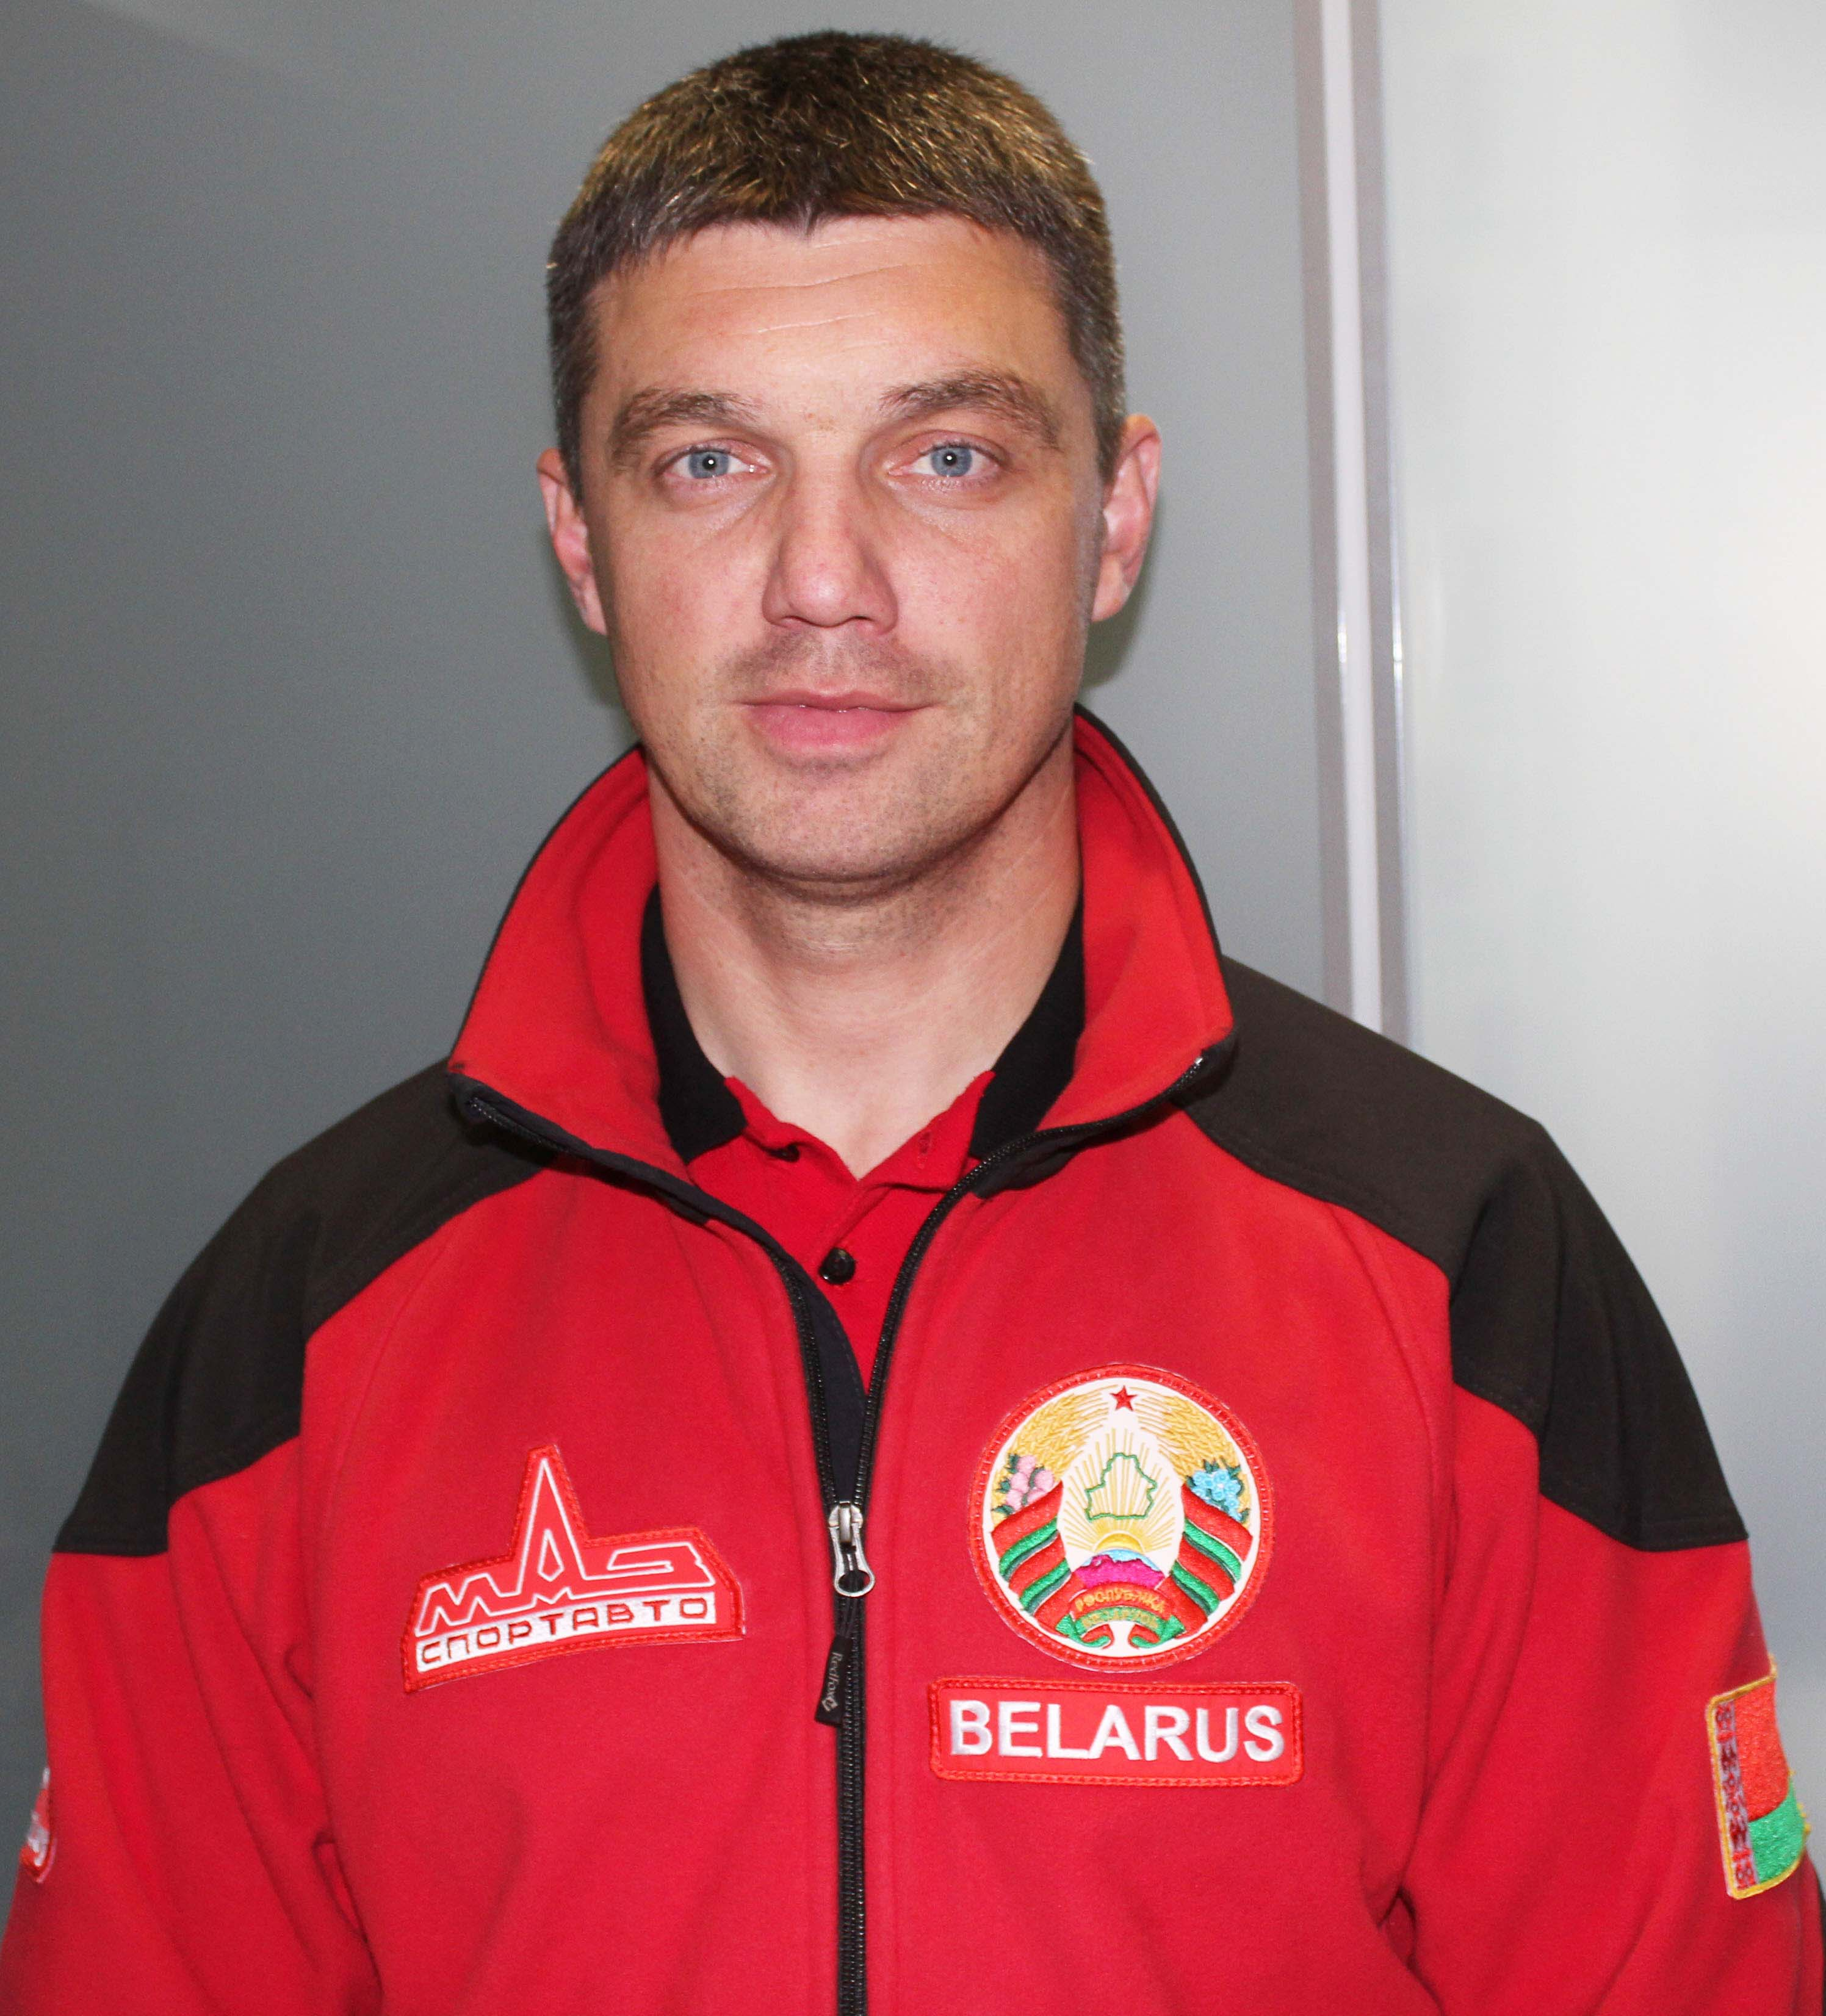 Сергей Вязович — руководитель команды  «МАЗ-СПОРТавто»